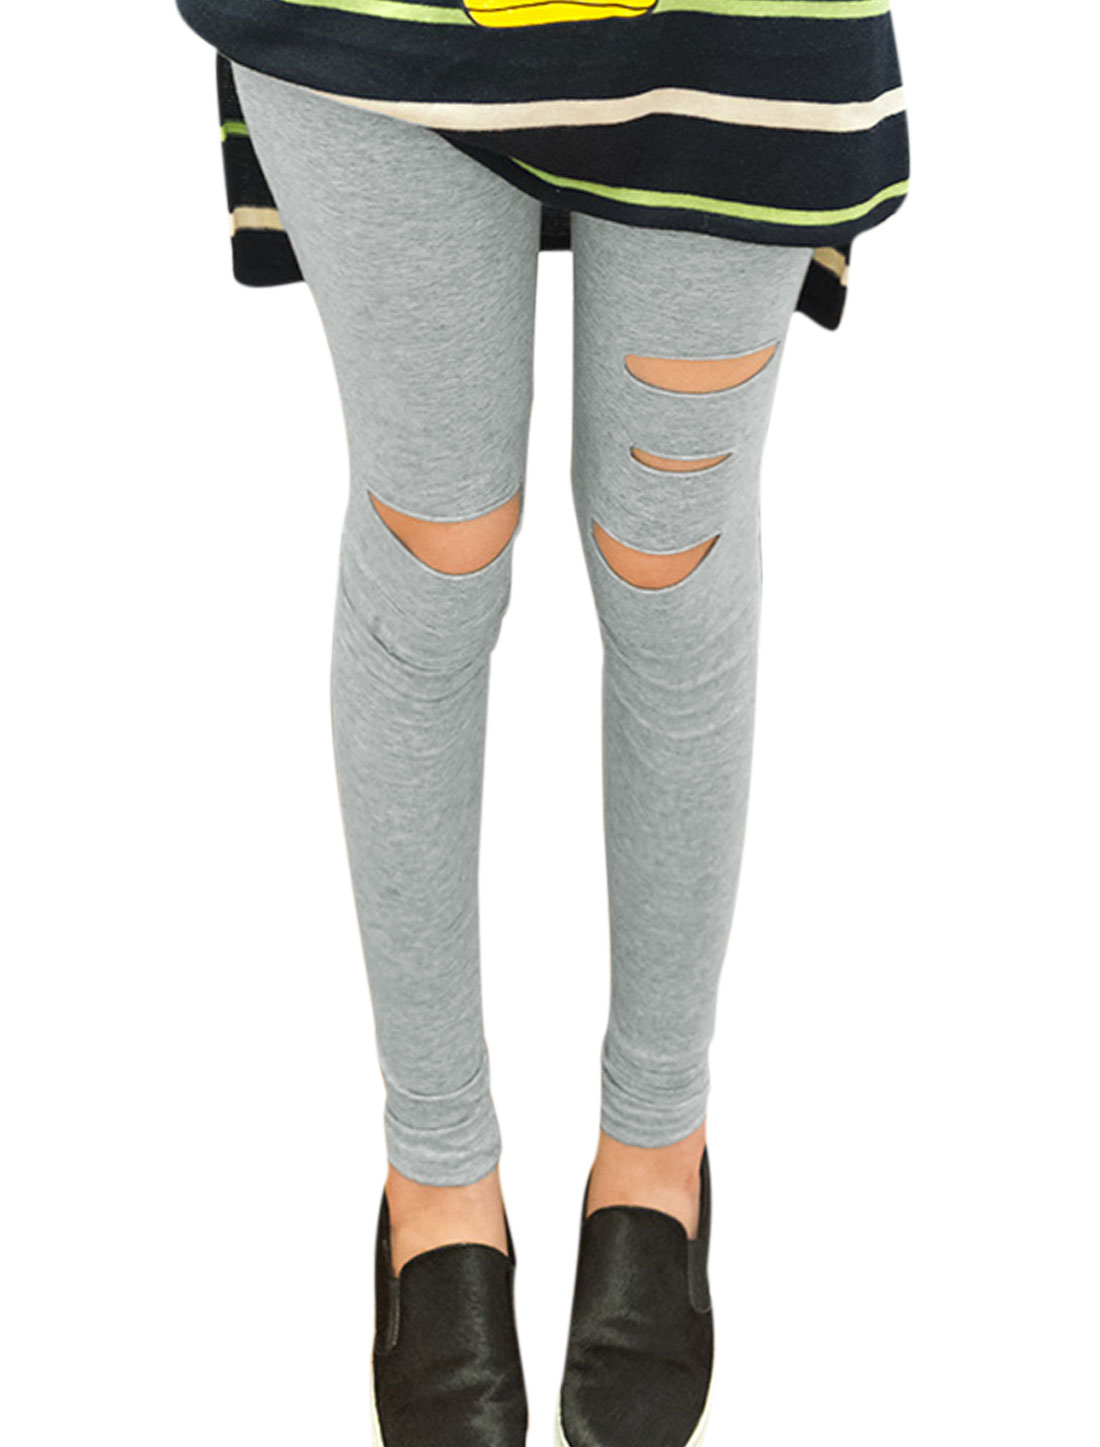 Women Fashion Style Cut Out Design Slim Fit Leggings Light Gray XS